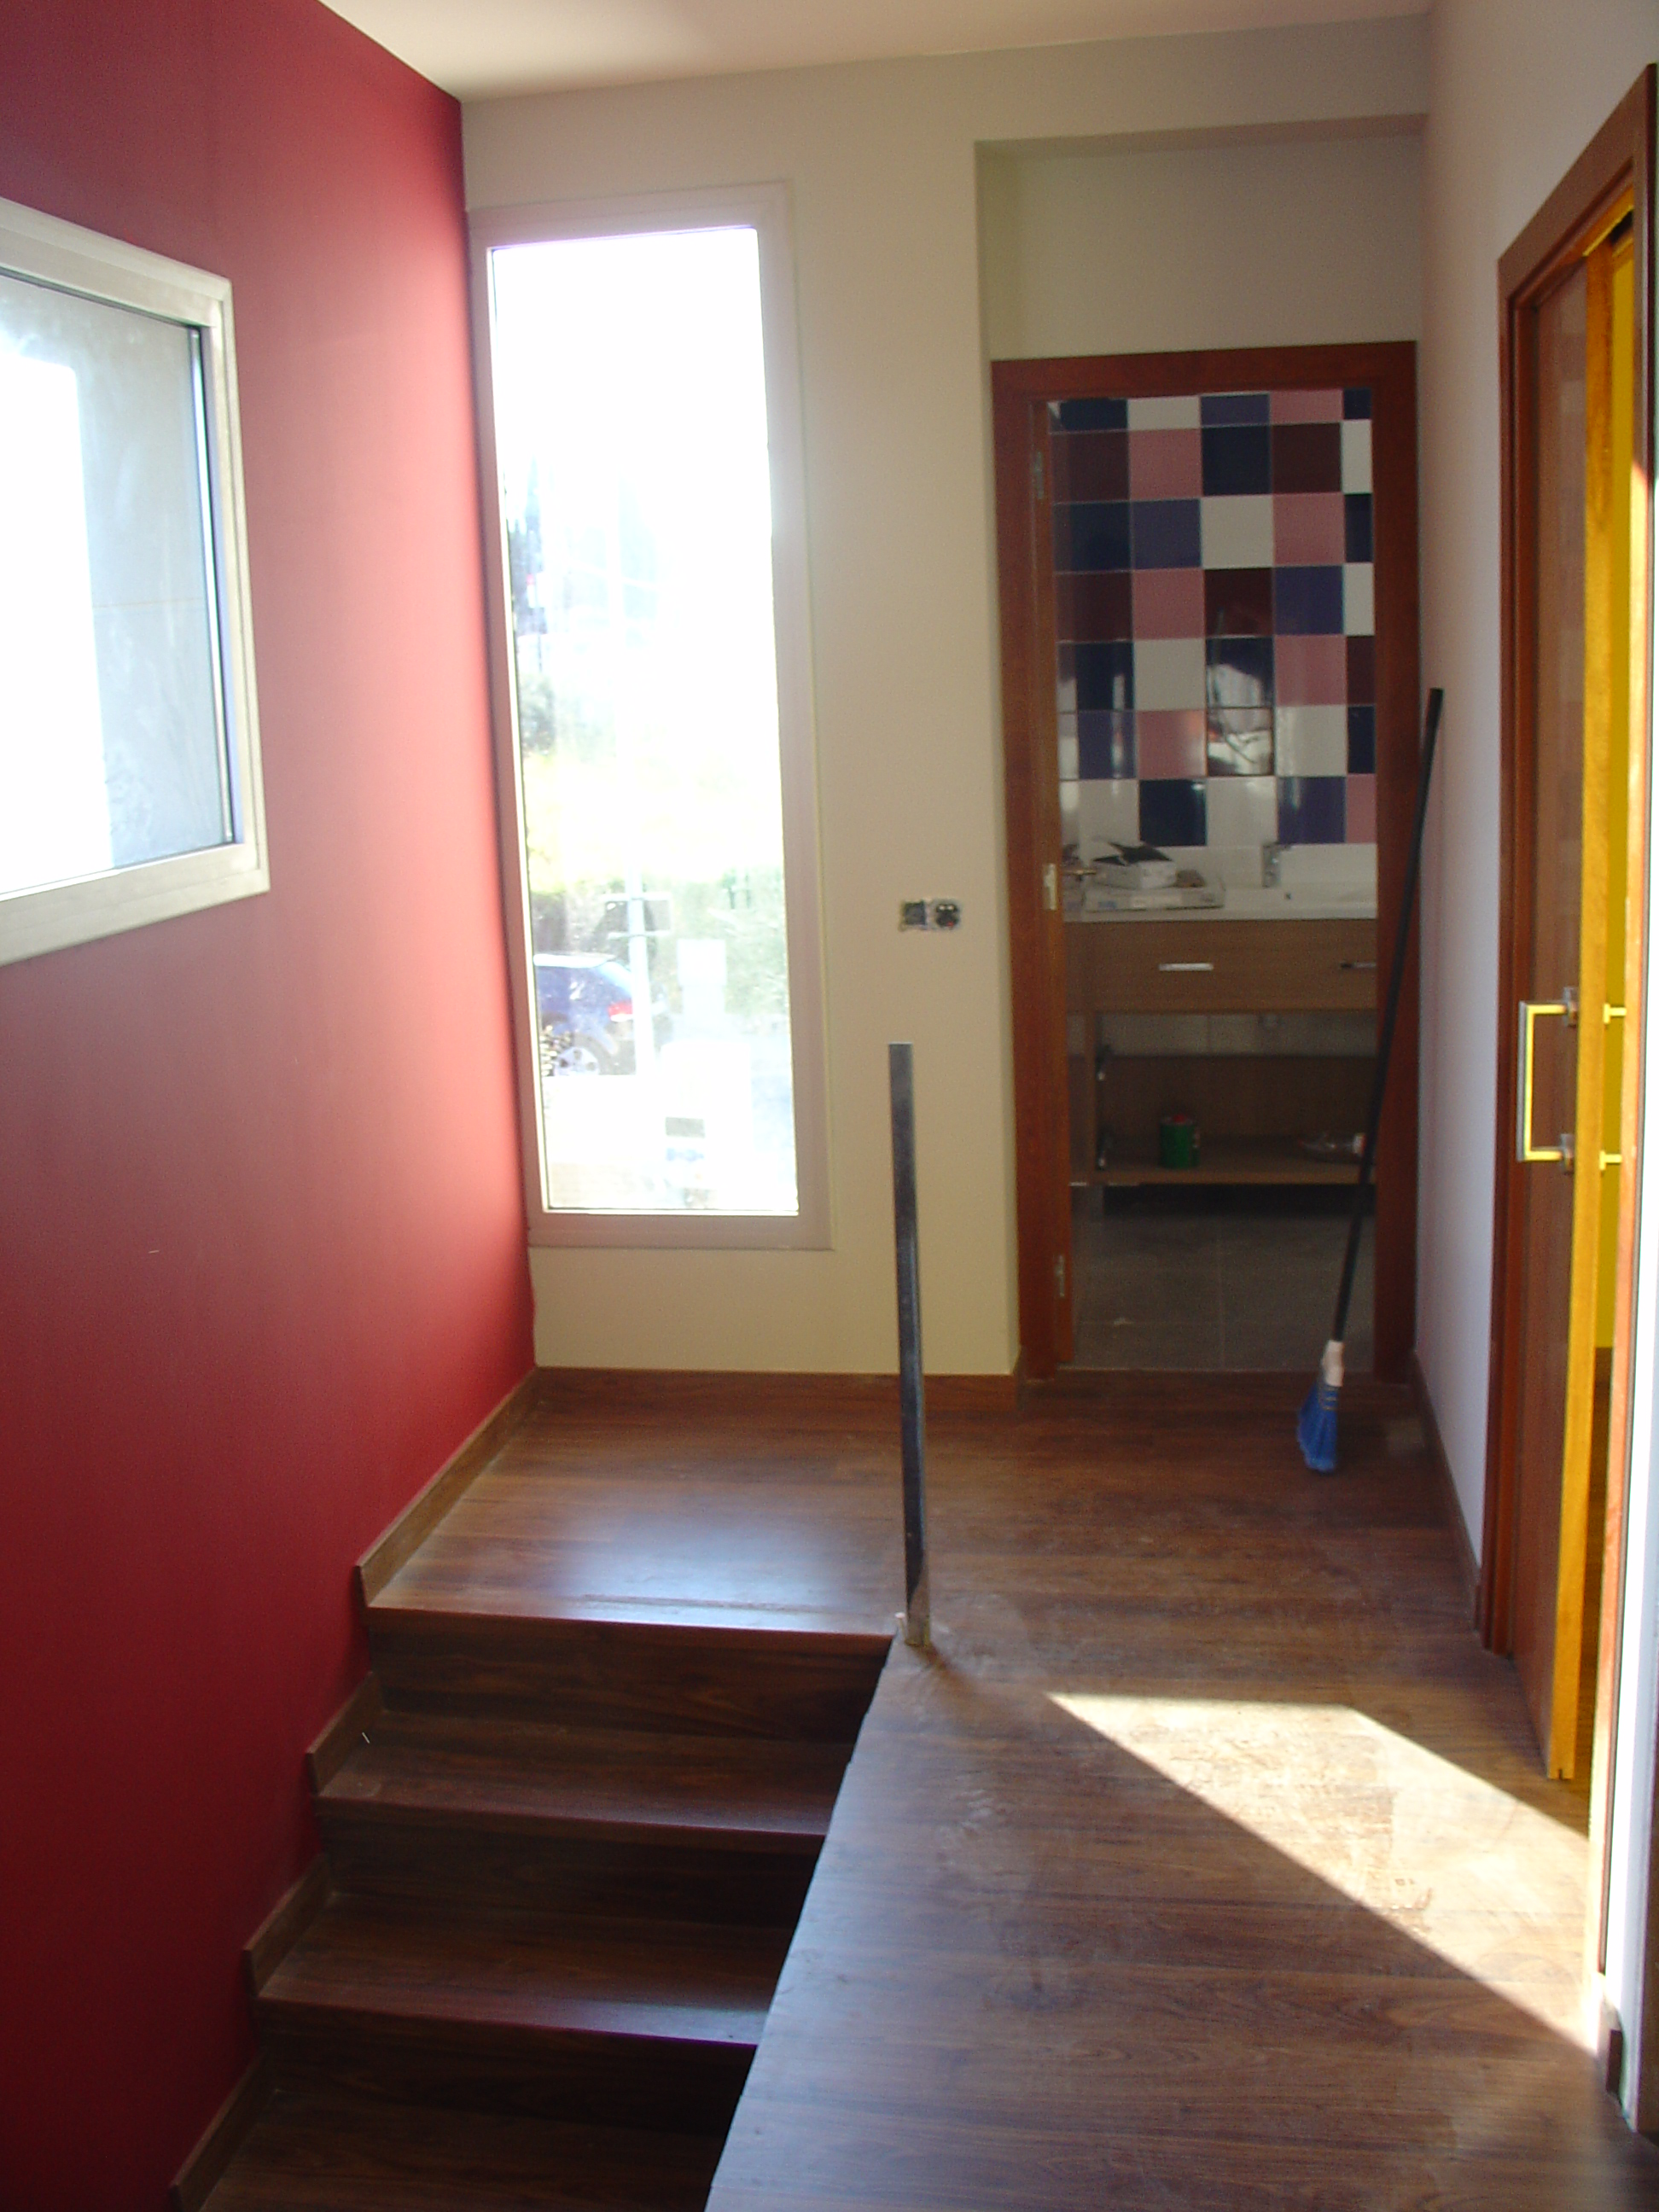 Habitatge unifamiliar – Hostalets de Pierola